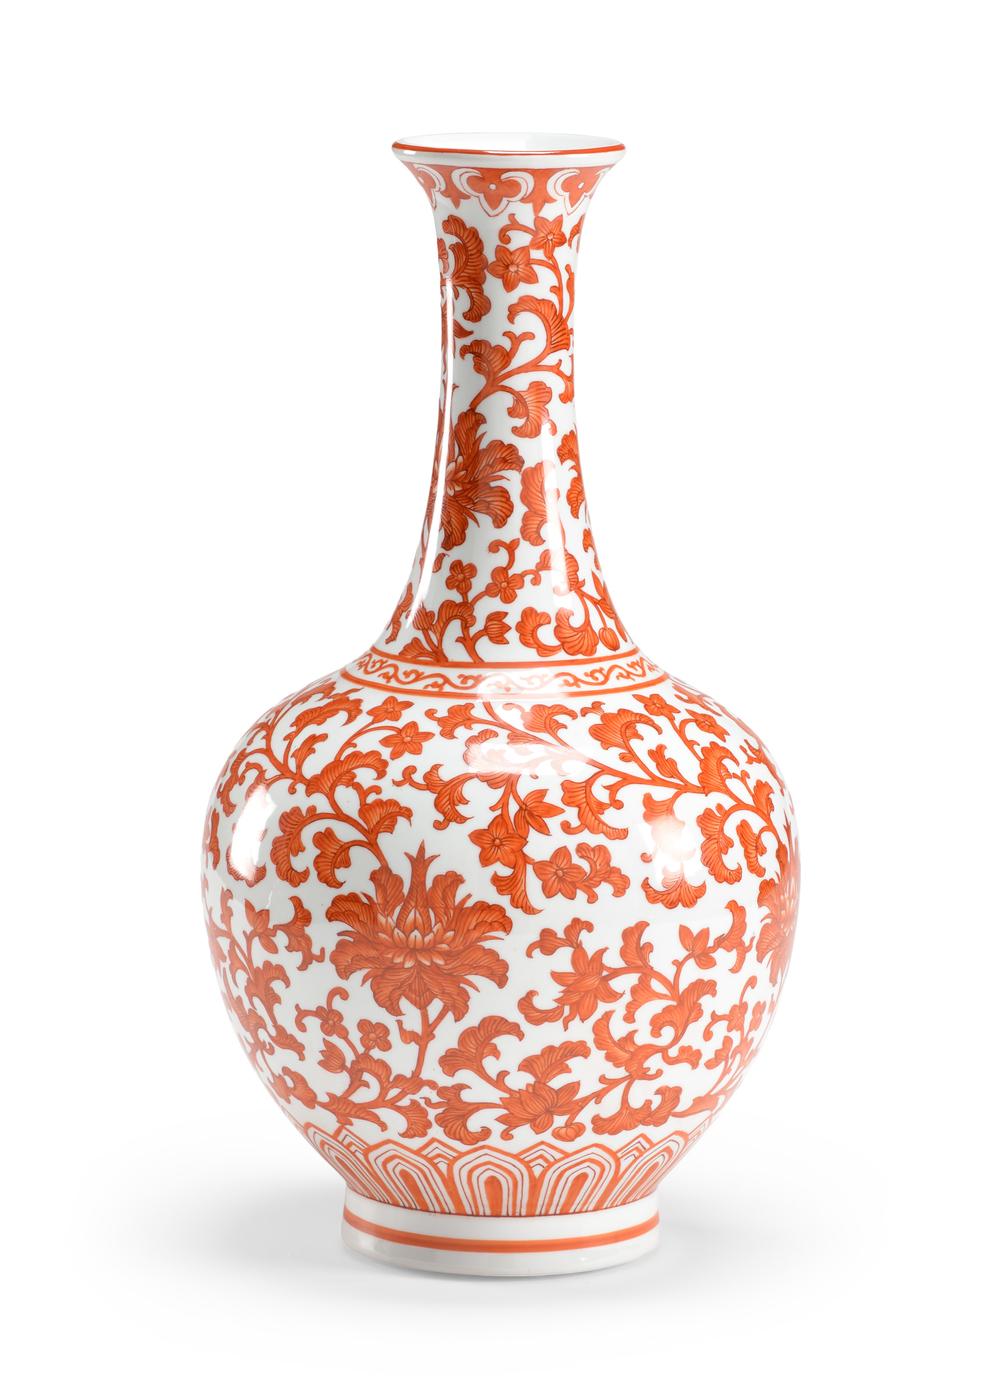 Chelsea House - Pumpkin Long Neck Vase